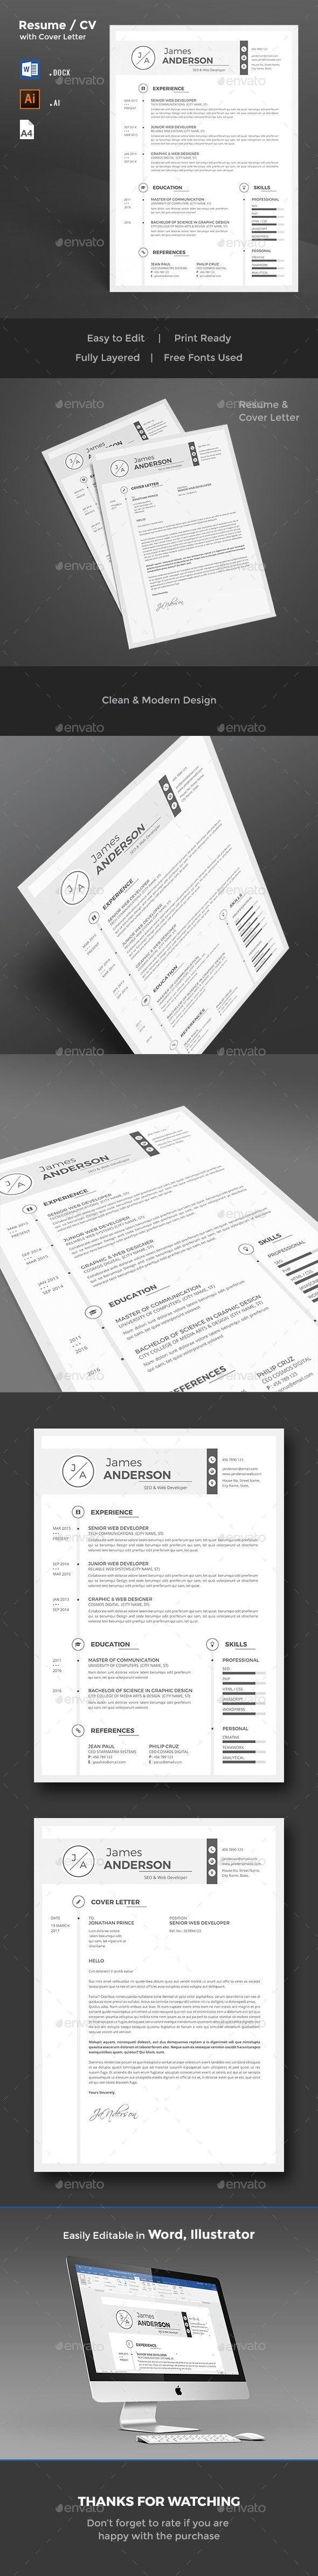 examples of nursing resumes skills%0A best ideas about Nursing Resume Template on Pinterest Nursing